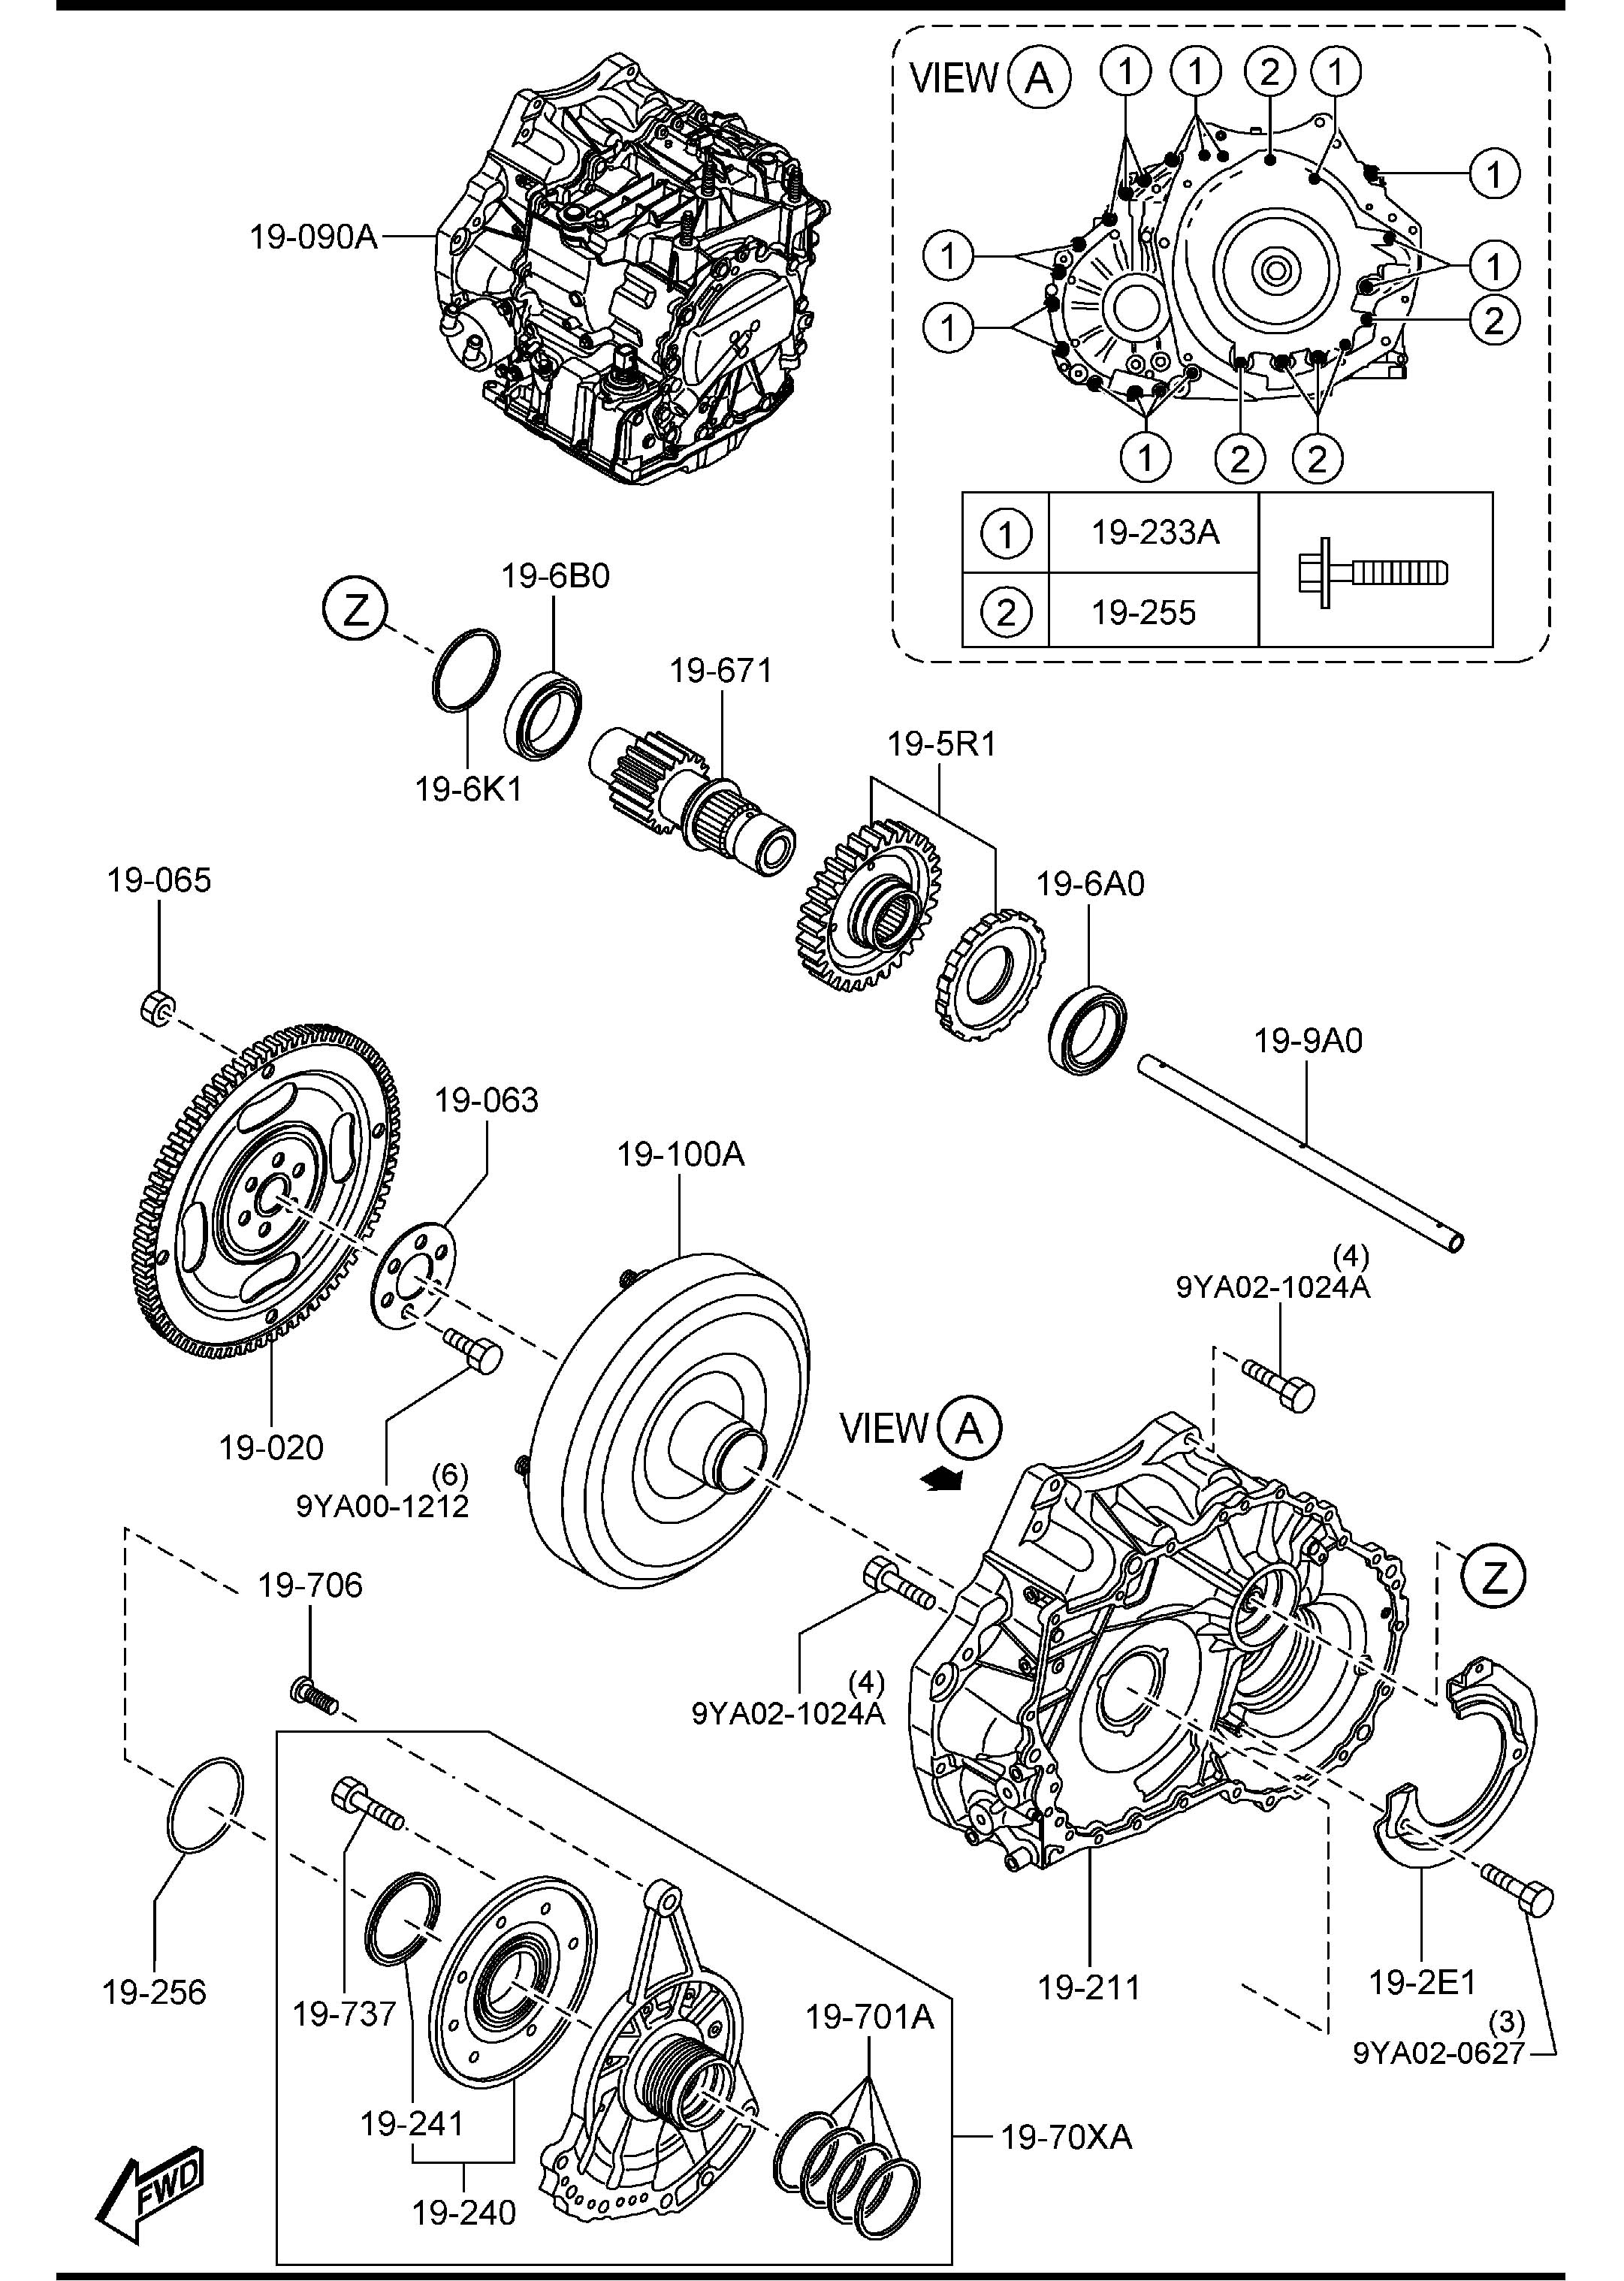 2014 Mazda AUTOMATIC TRANSMISSION TORQUE CONVERTER, OIL